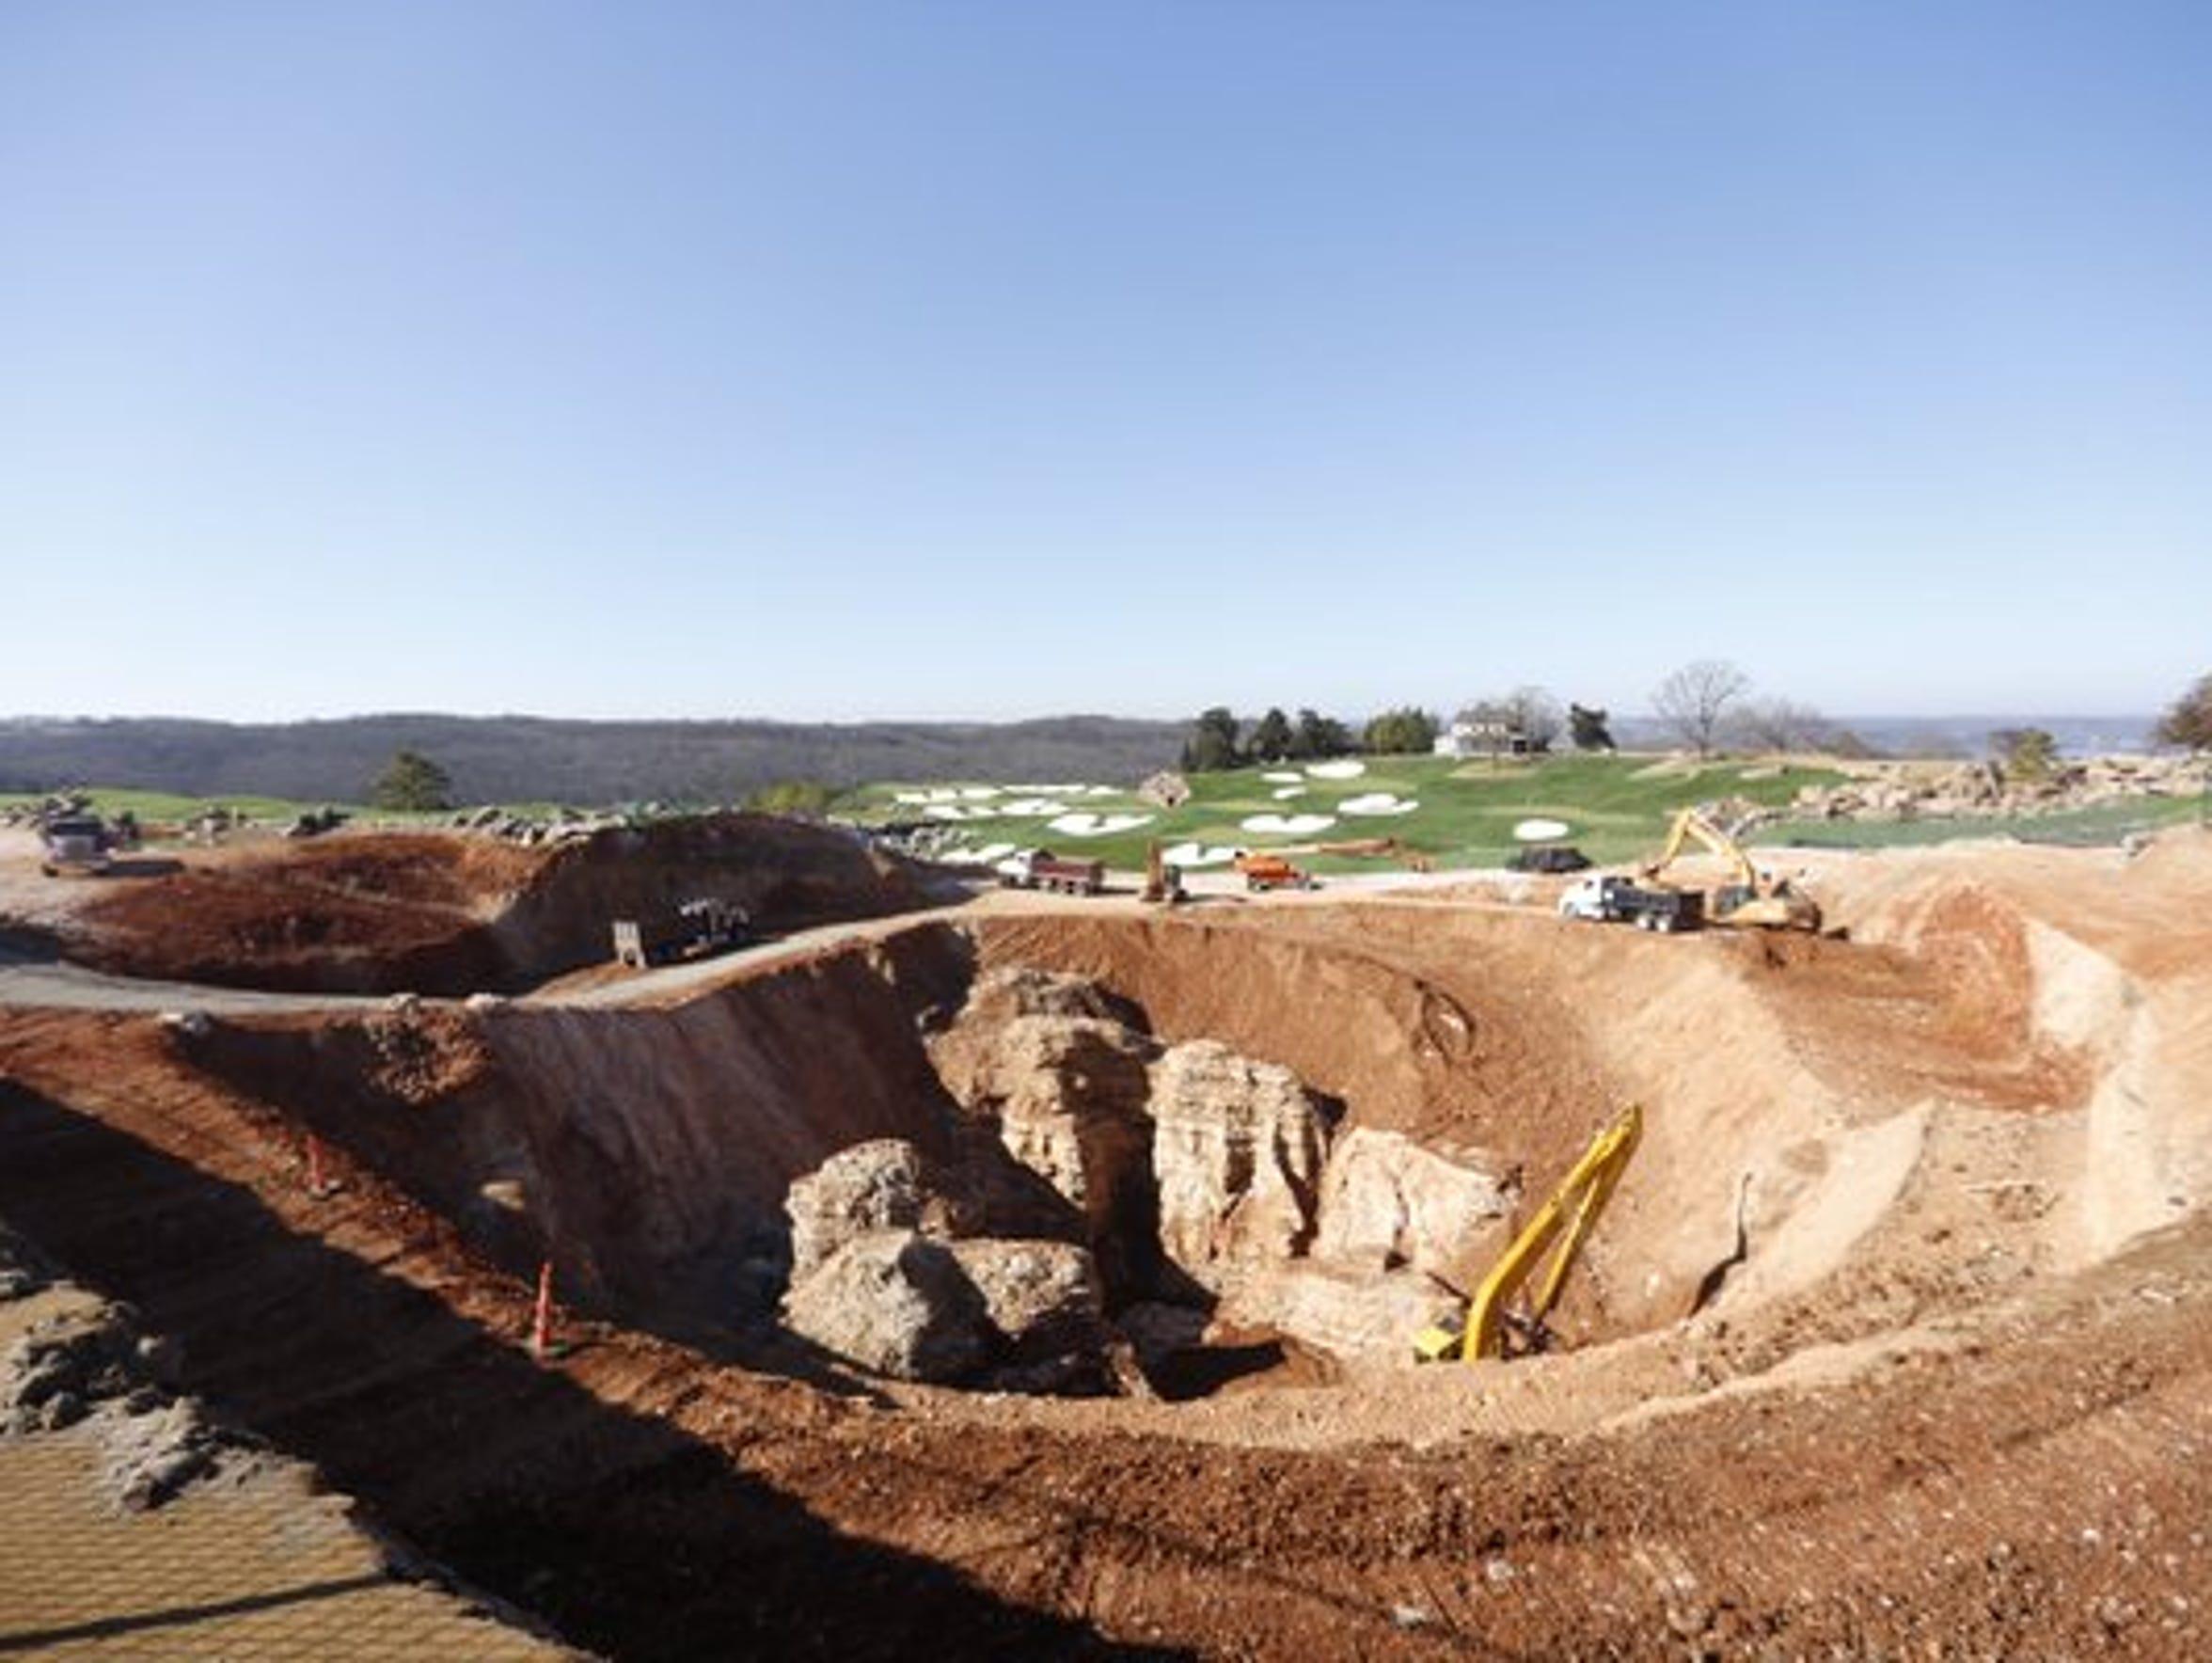 Pillars of rock are being exposed by excavator crews.